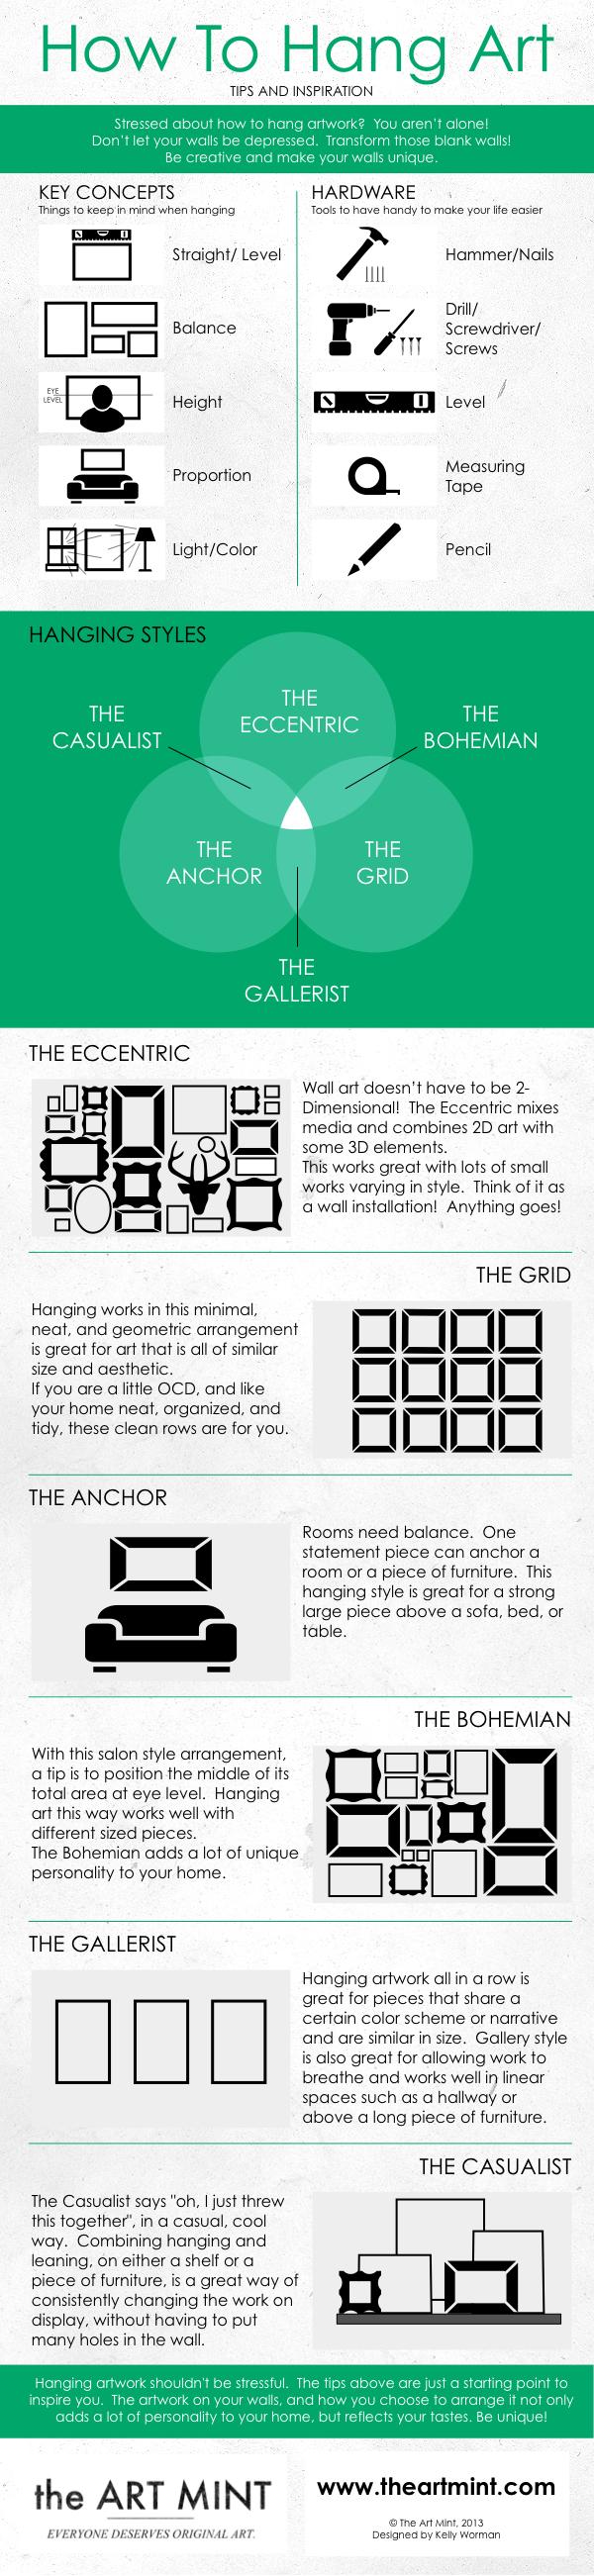 how-to-hang-artwork_51892bc8324da